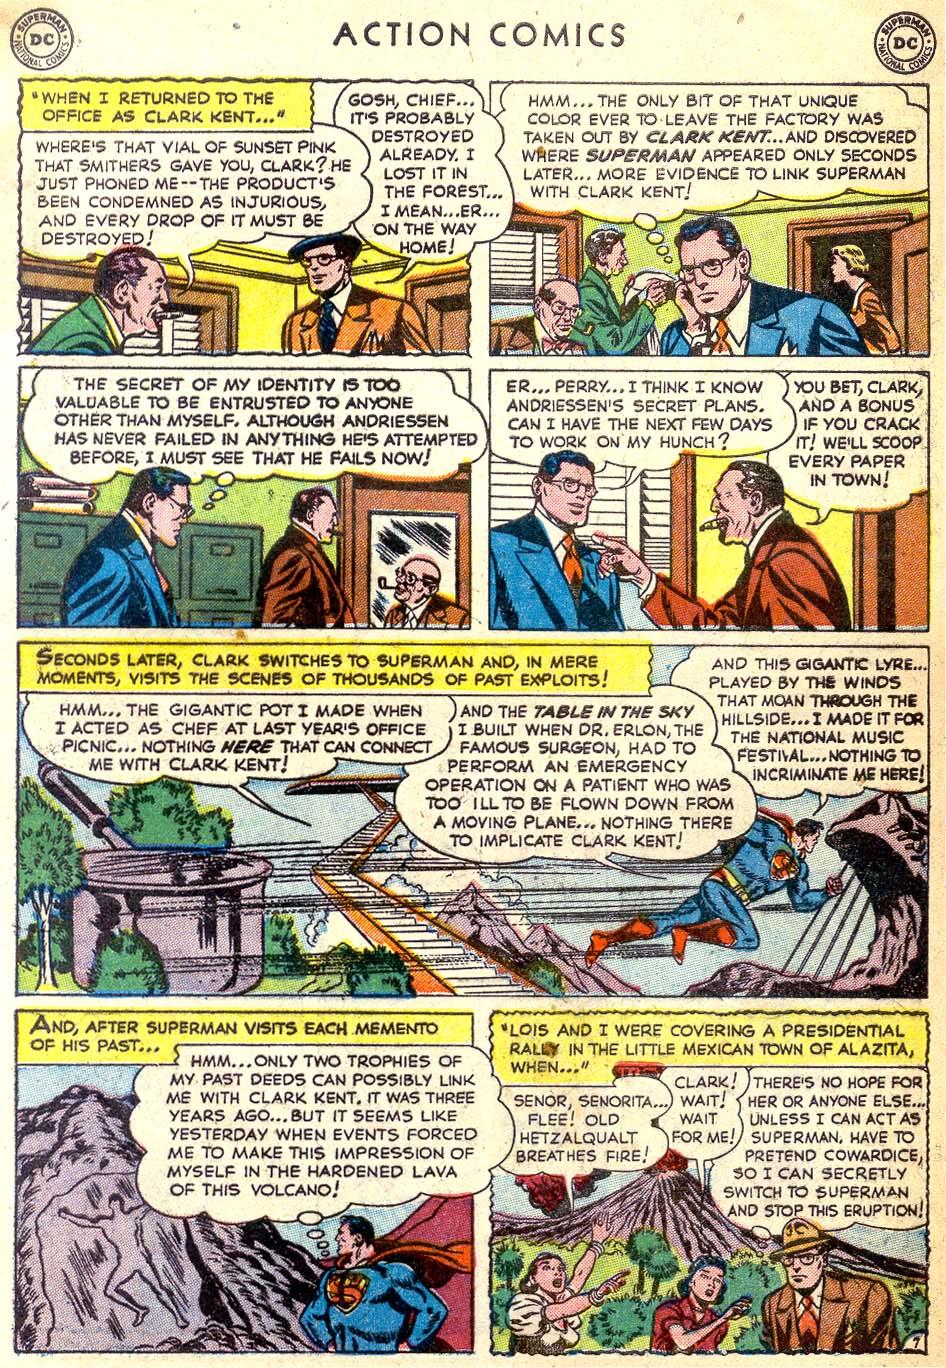 Action Comics (1938) 164 Page 8